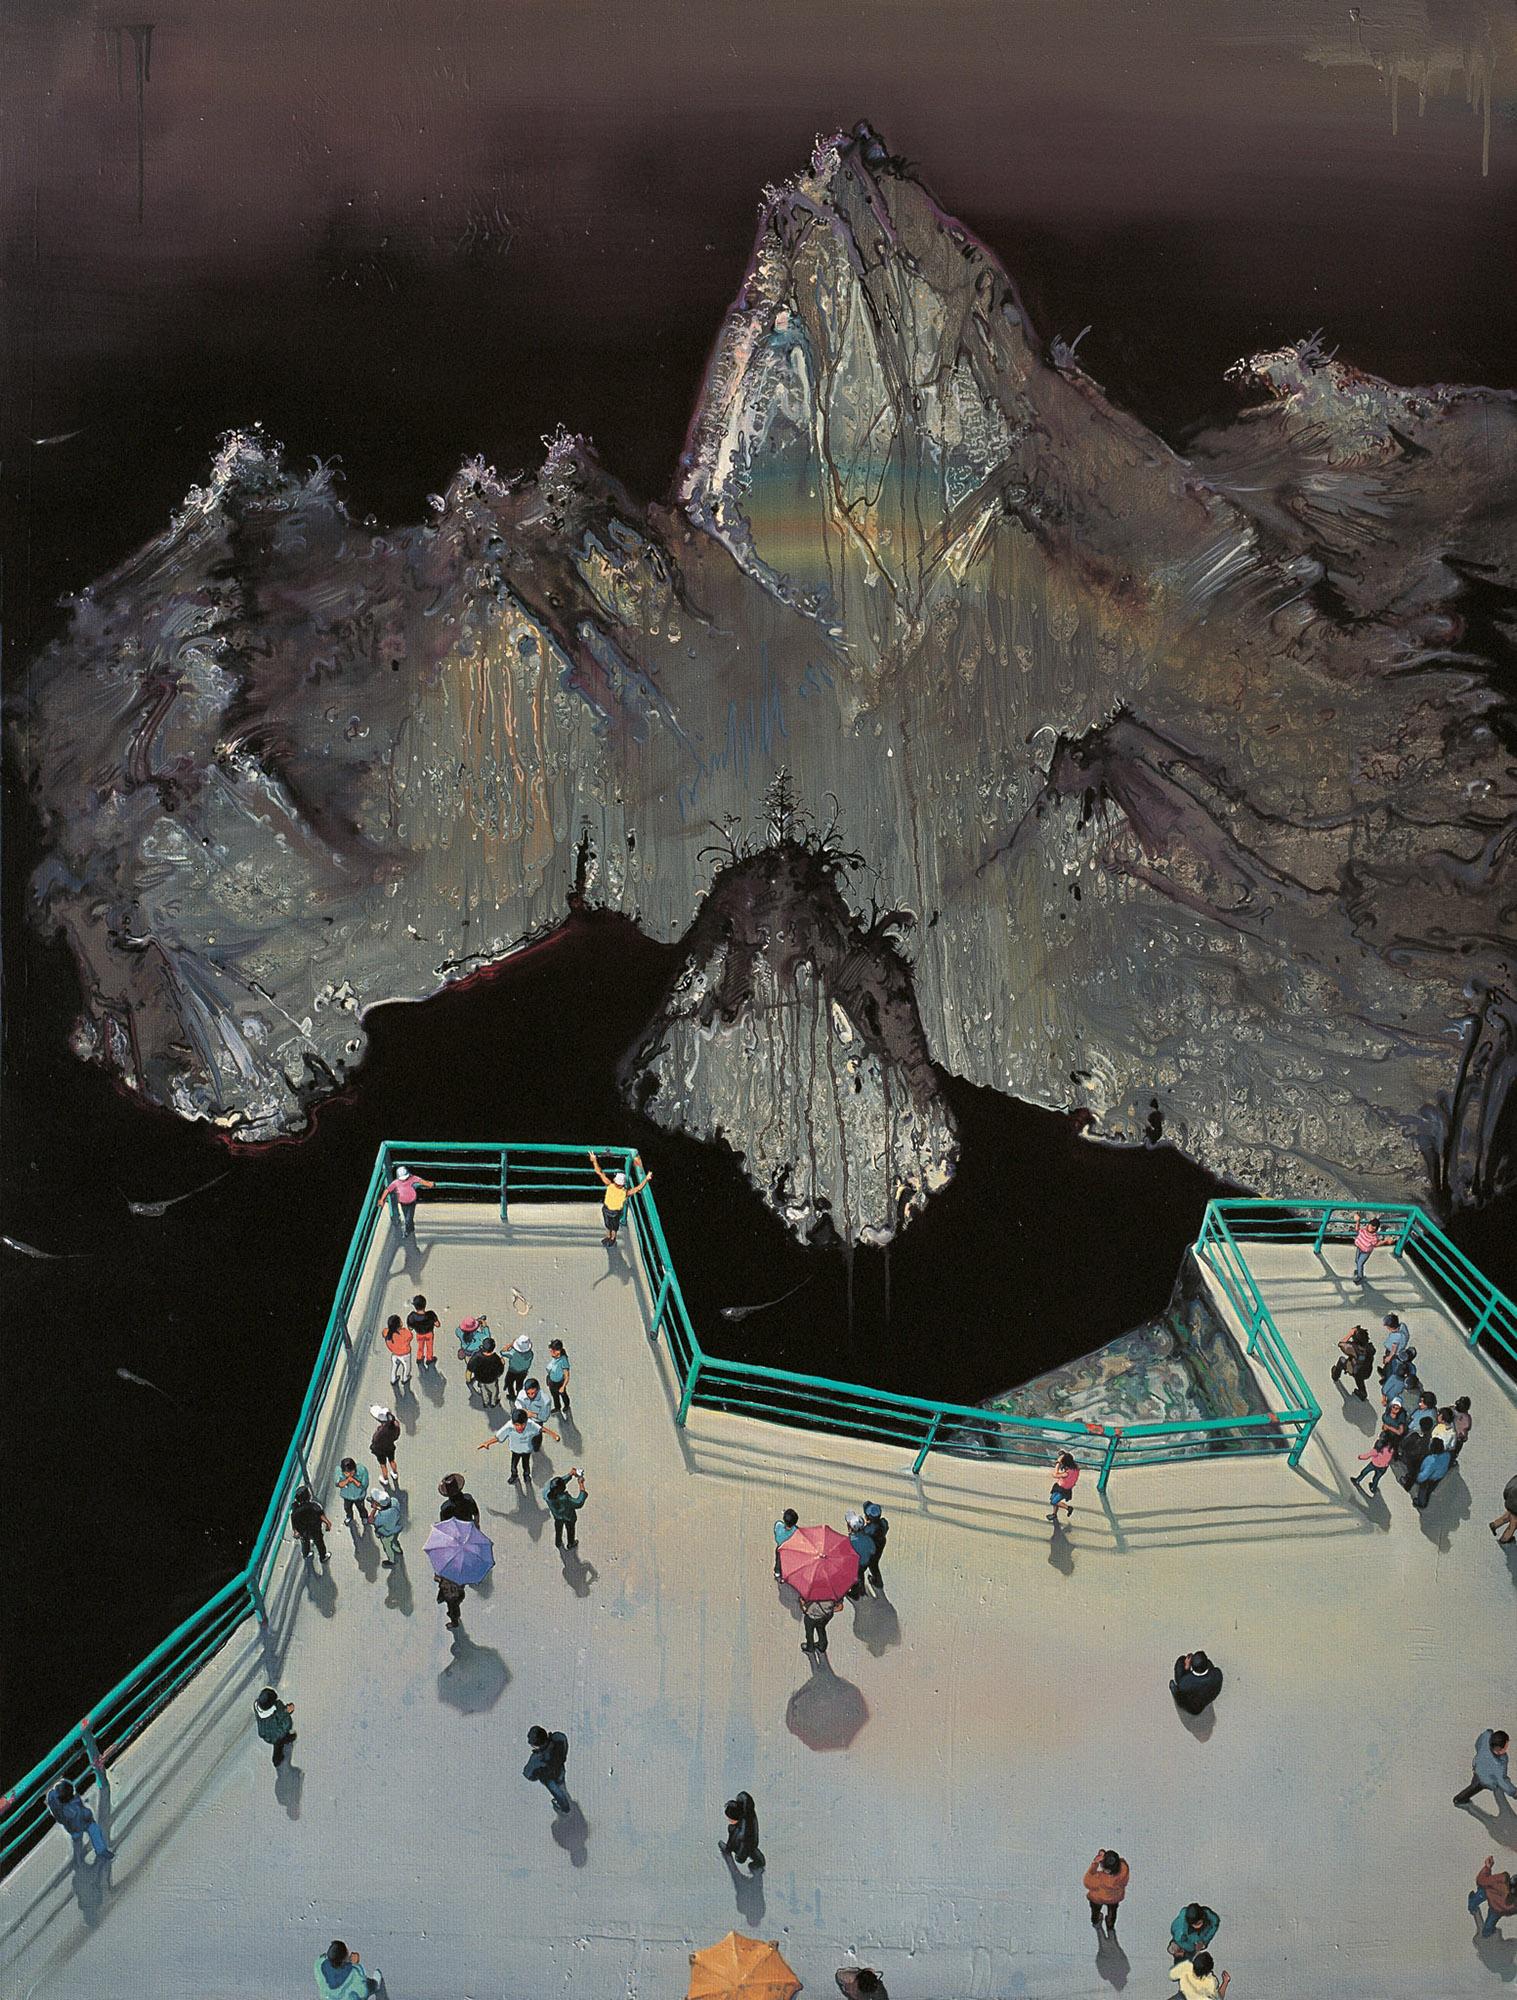 Zhou Jinhua 周金华, Viewing Platform 大看台, 2010, Oil on canvas 布面油画, 190 x 145 cm